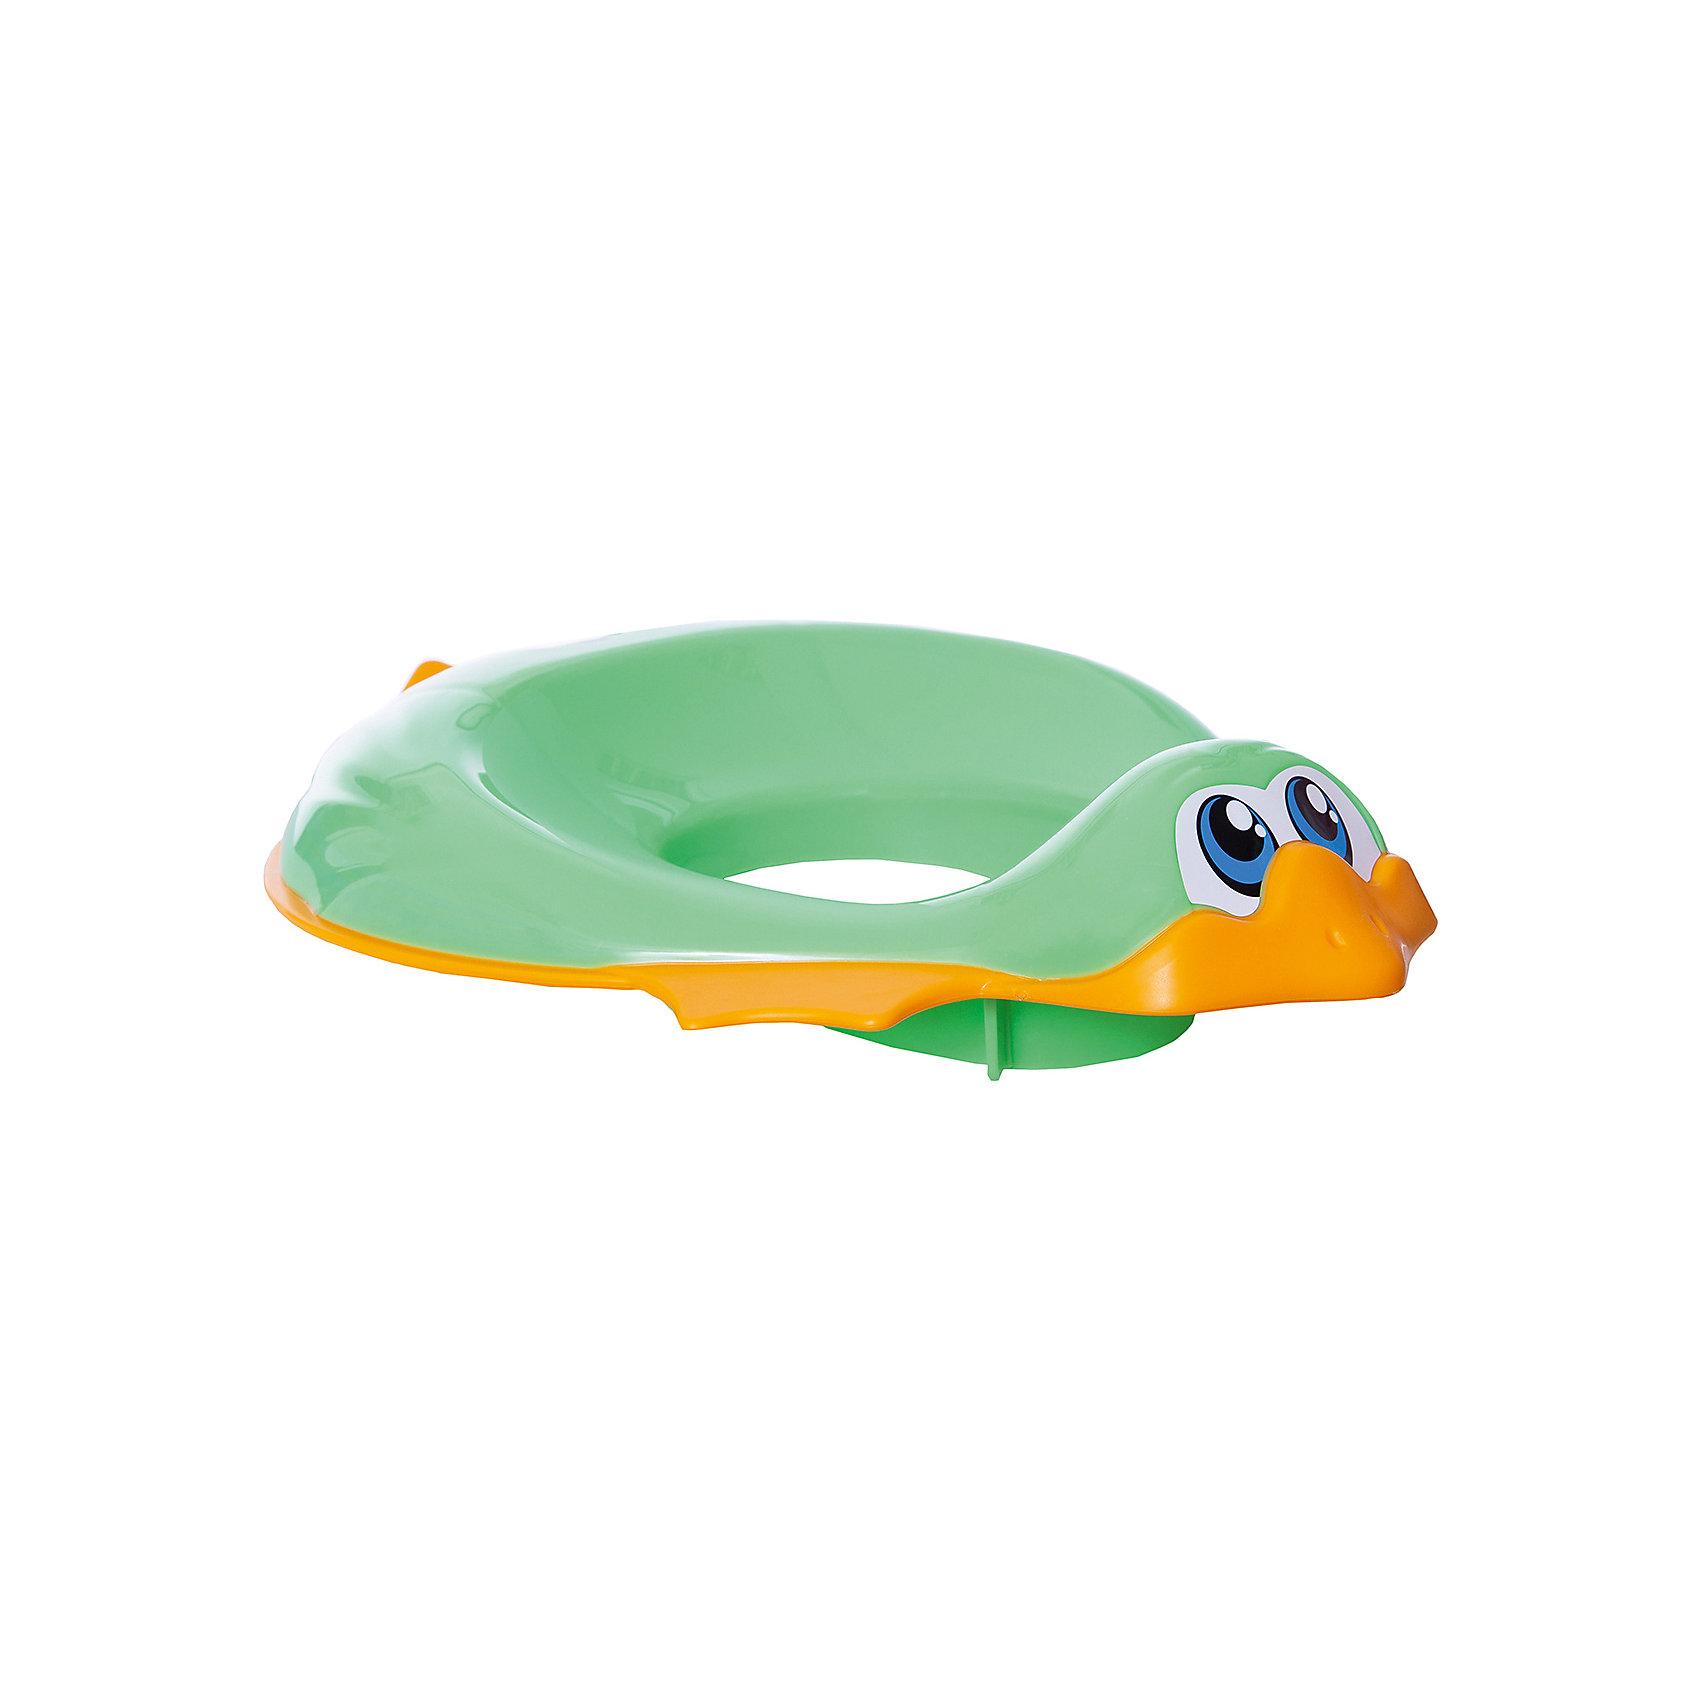 Накладка на унитаз, Ducka, Ok Baby, зеленый (OK Baby)